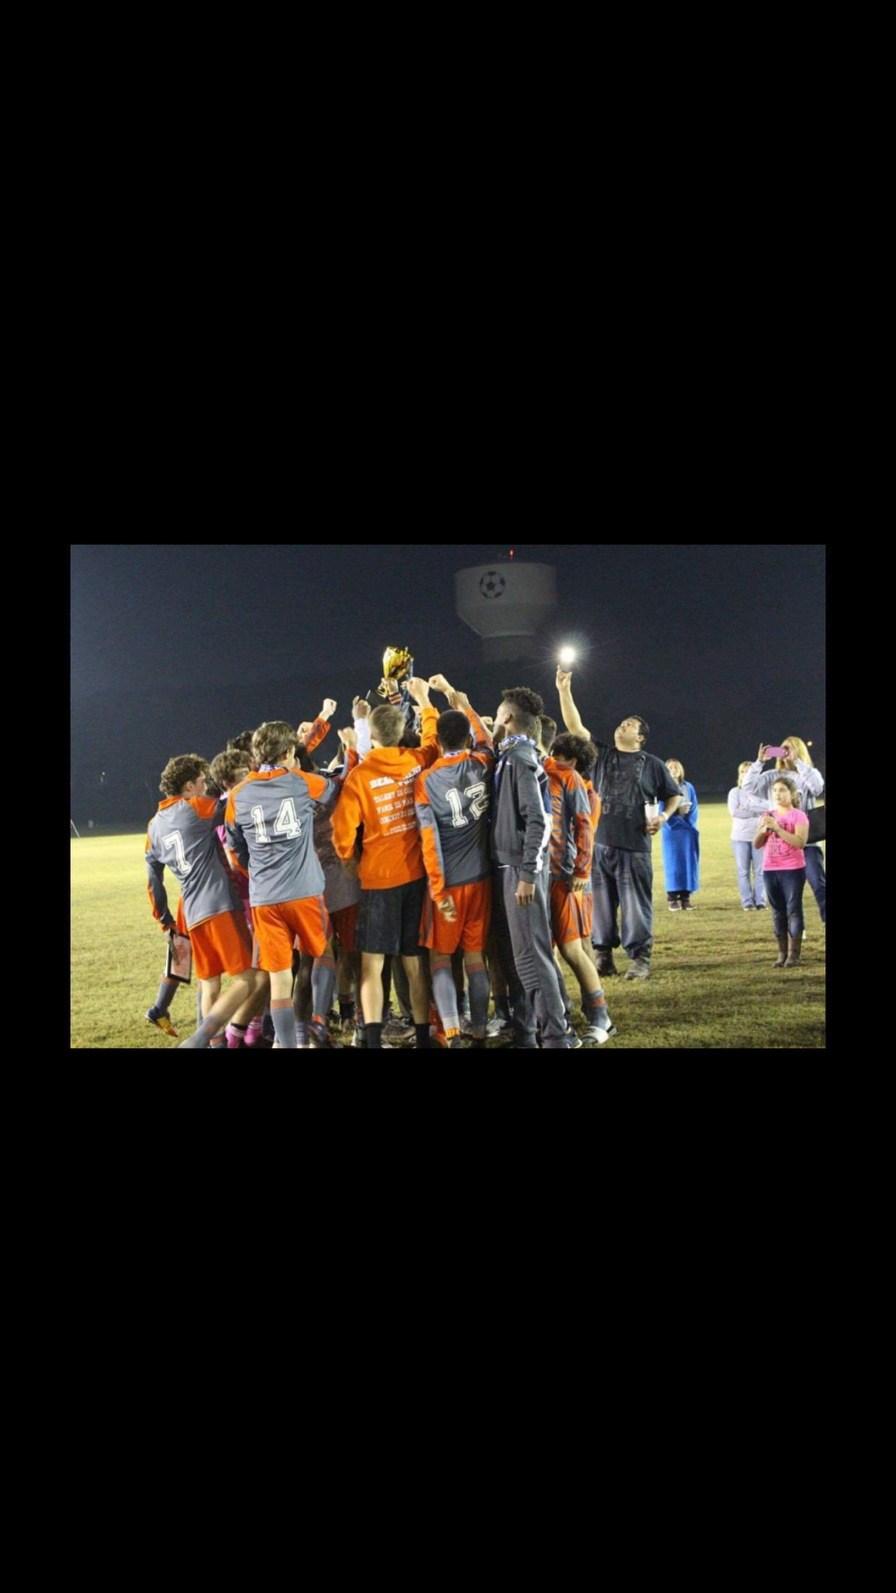 Boys Soccer Team members in a huddle.